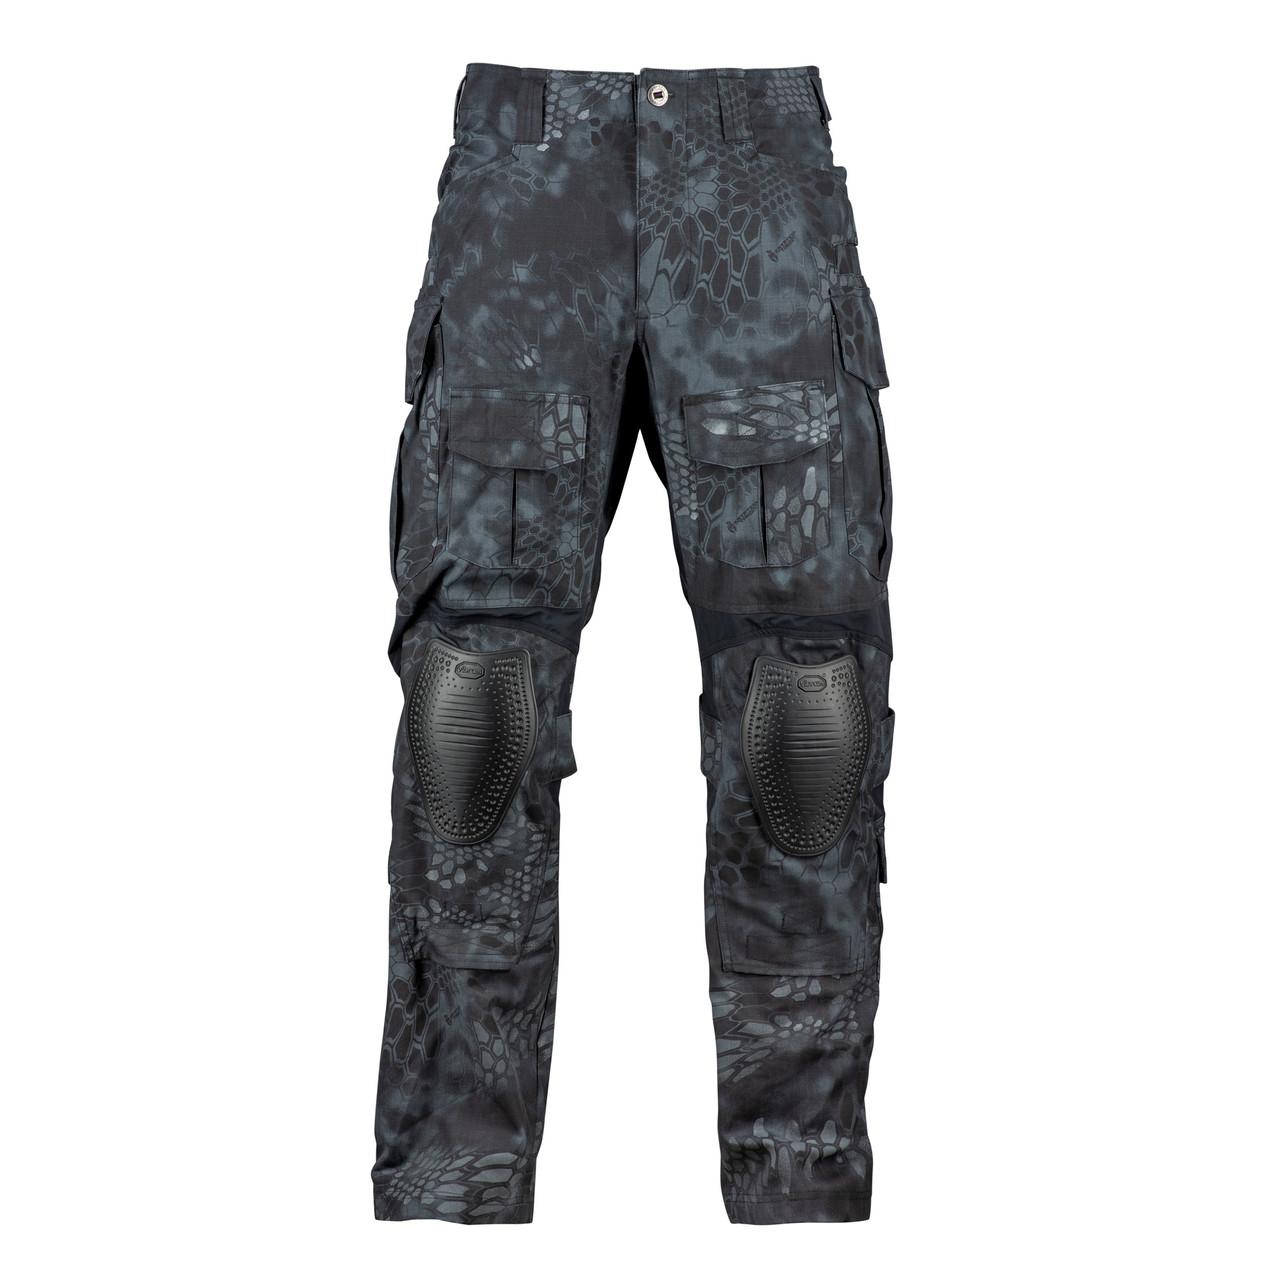 Surplus Airborne Mens Baggy Trousers Combat Army Work Pants Black Camo Pattern